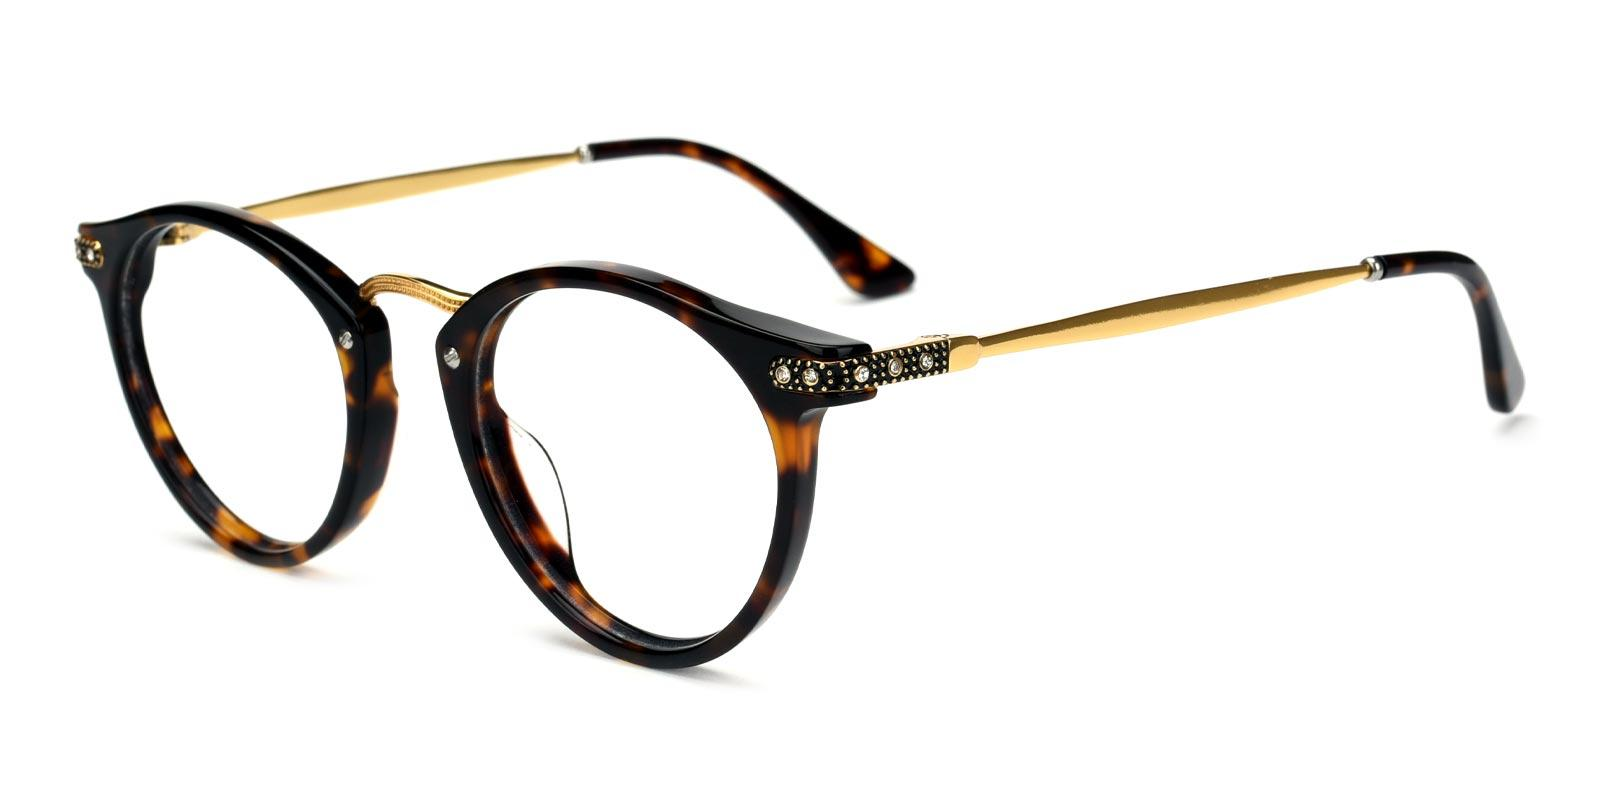 Donna-Tortoise-Round-Acetate-Eyeglasses-additional1